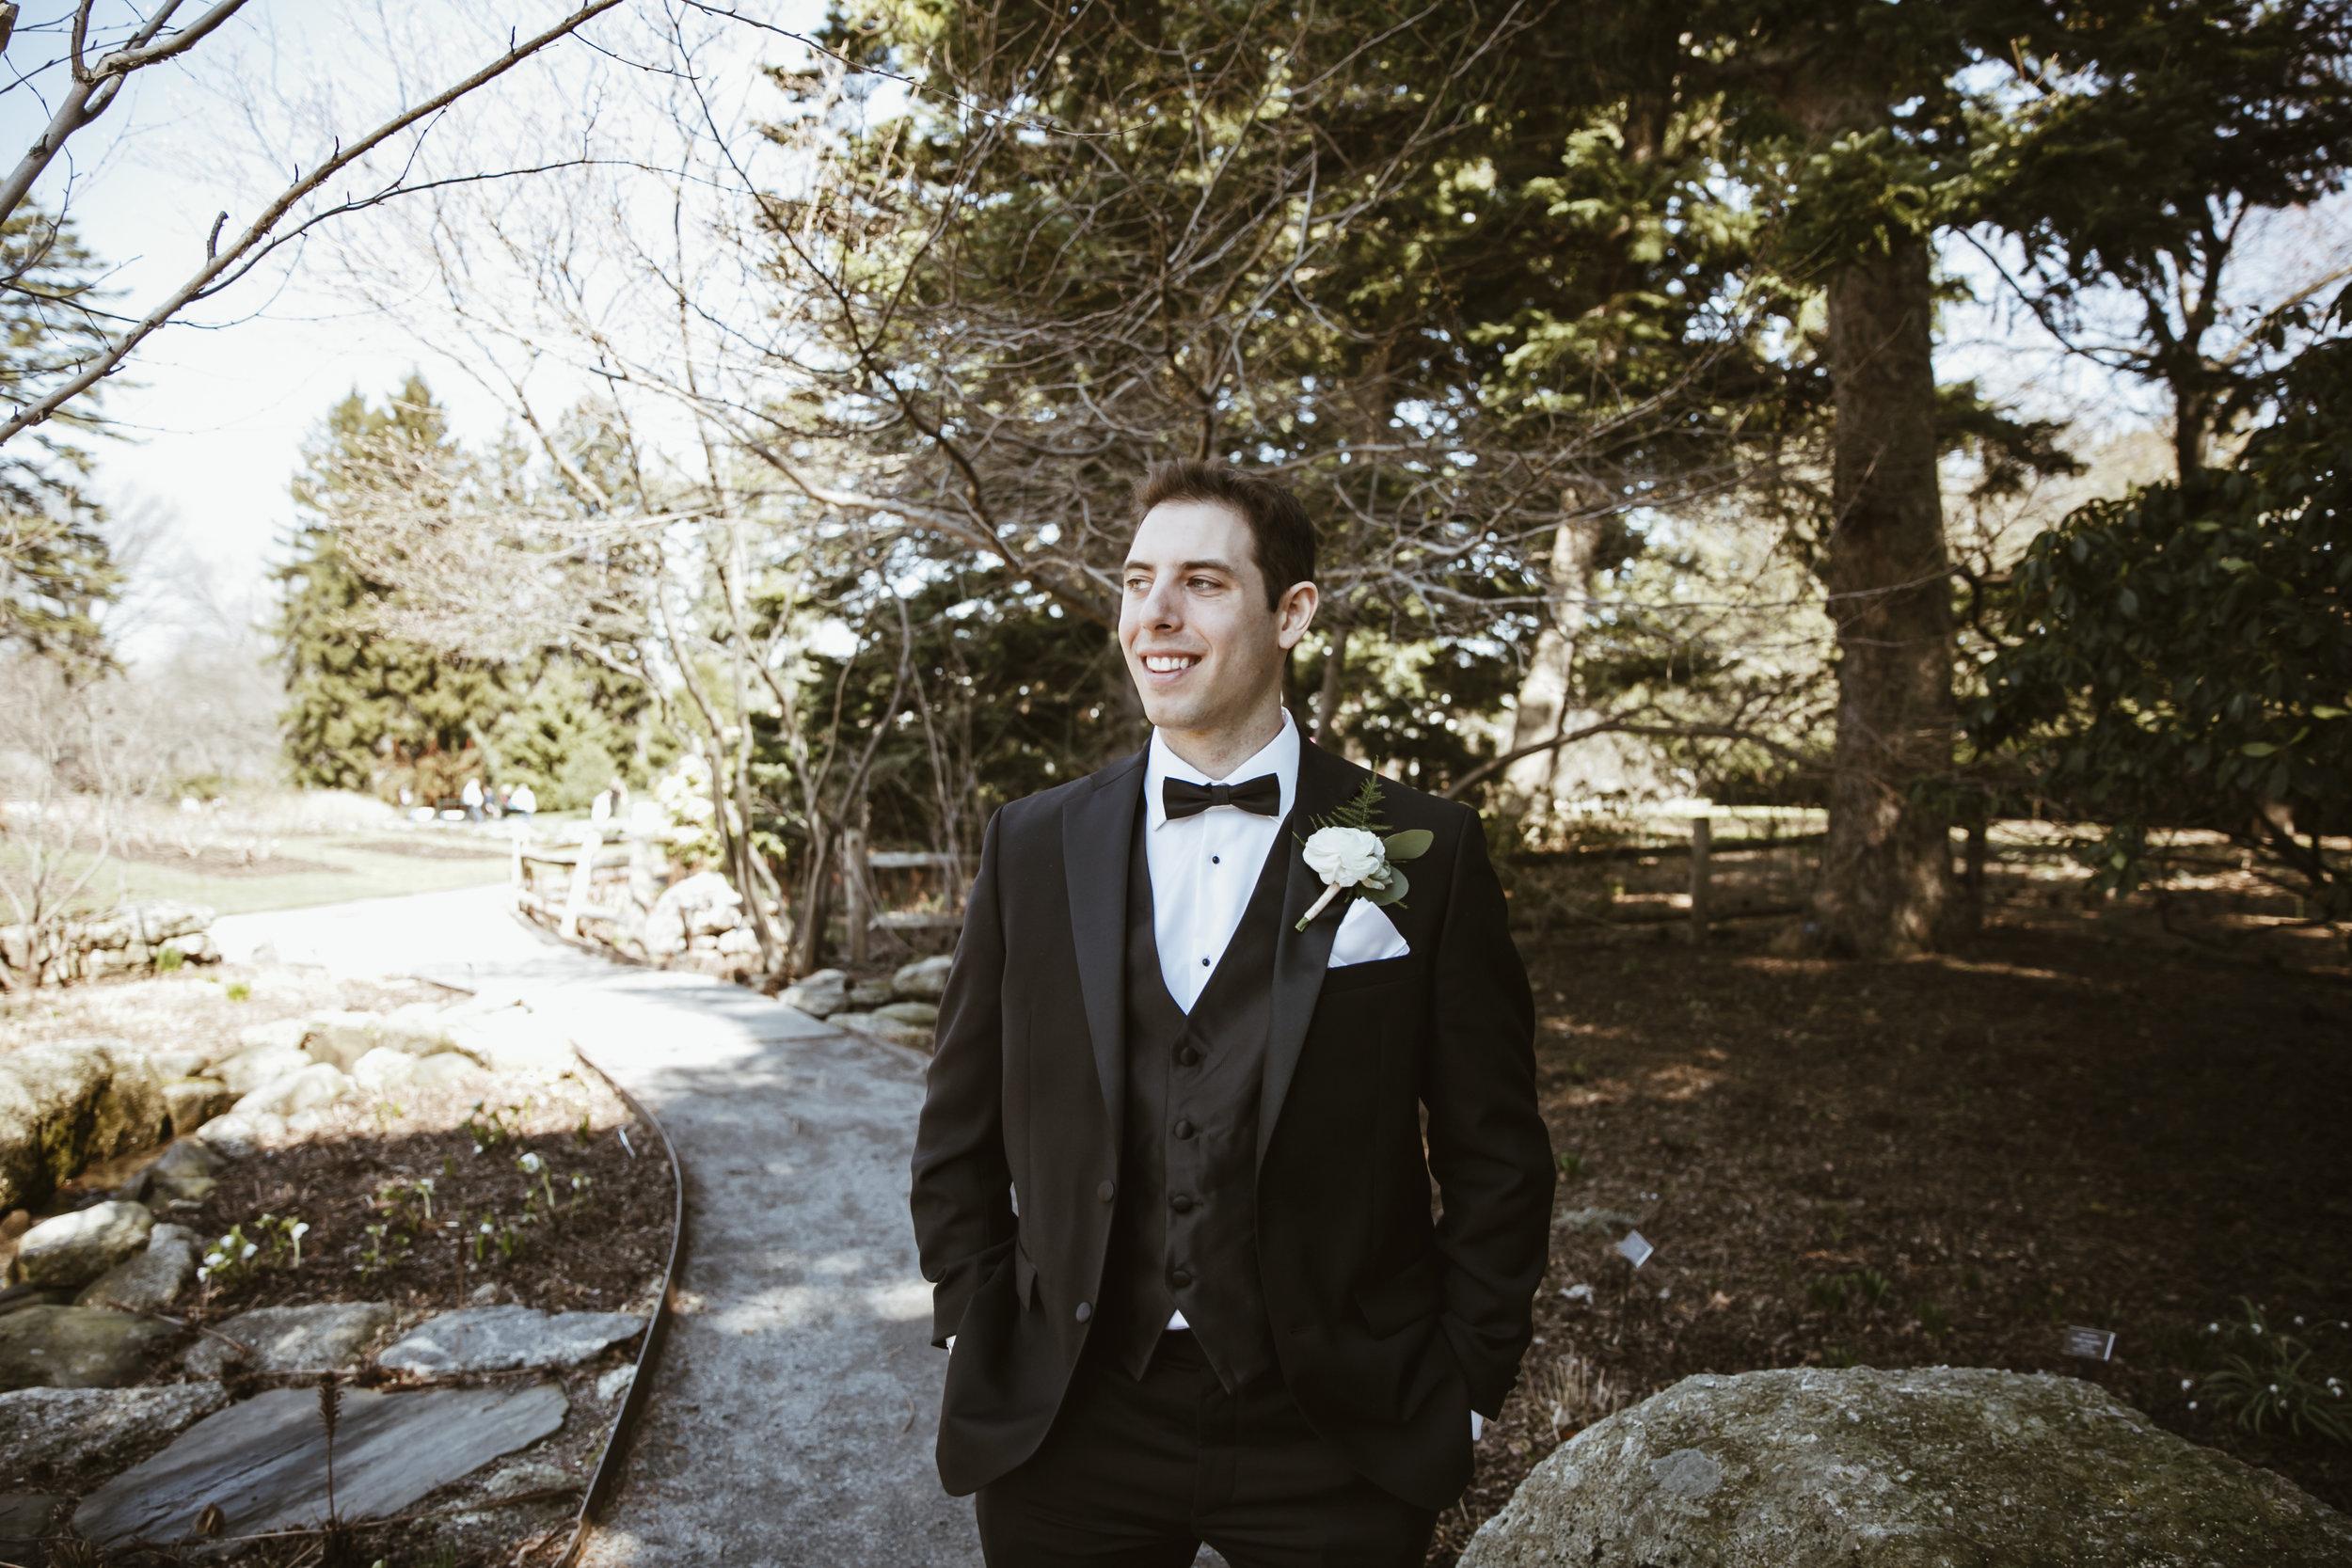 Lea & Greg Wedding at New York Botanical Garden by Unveiled-Weddings.com